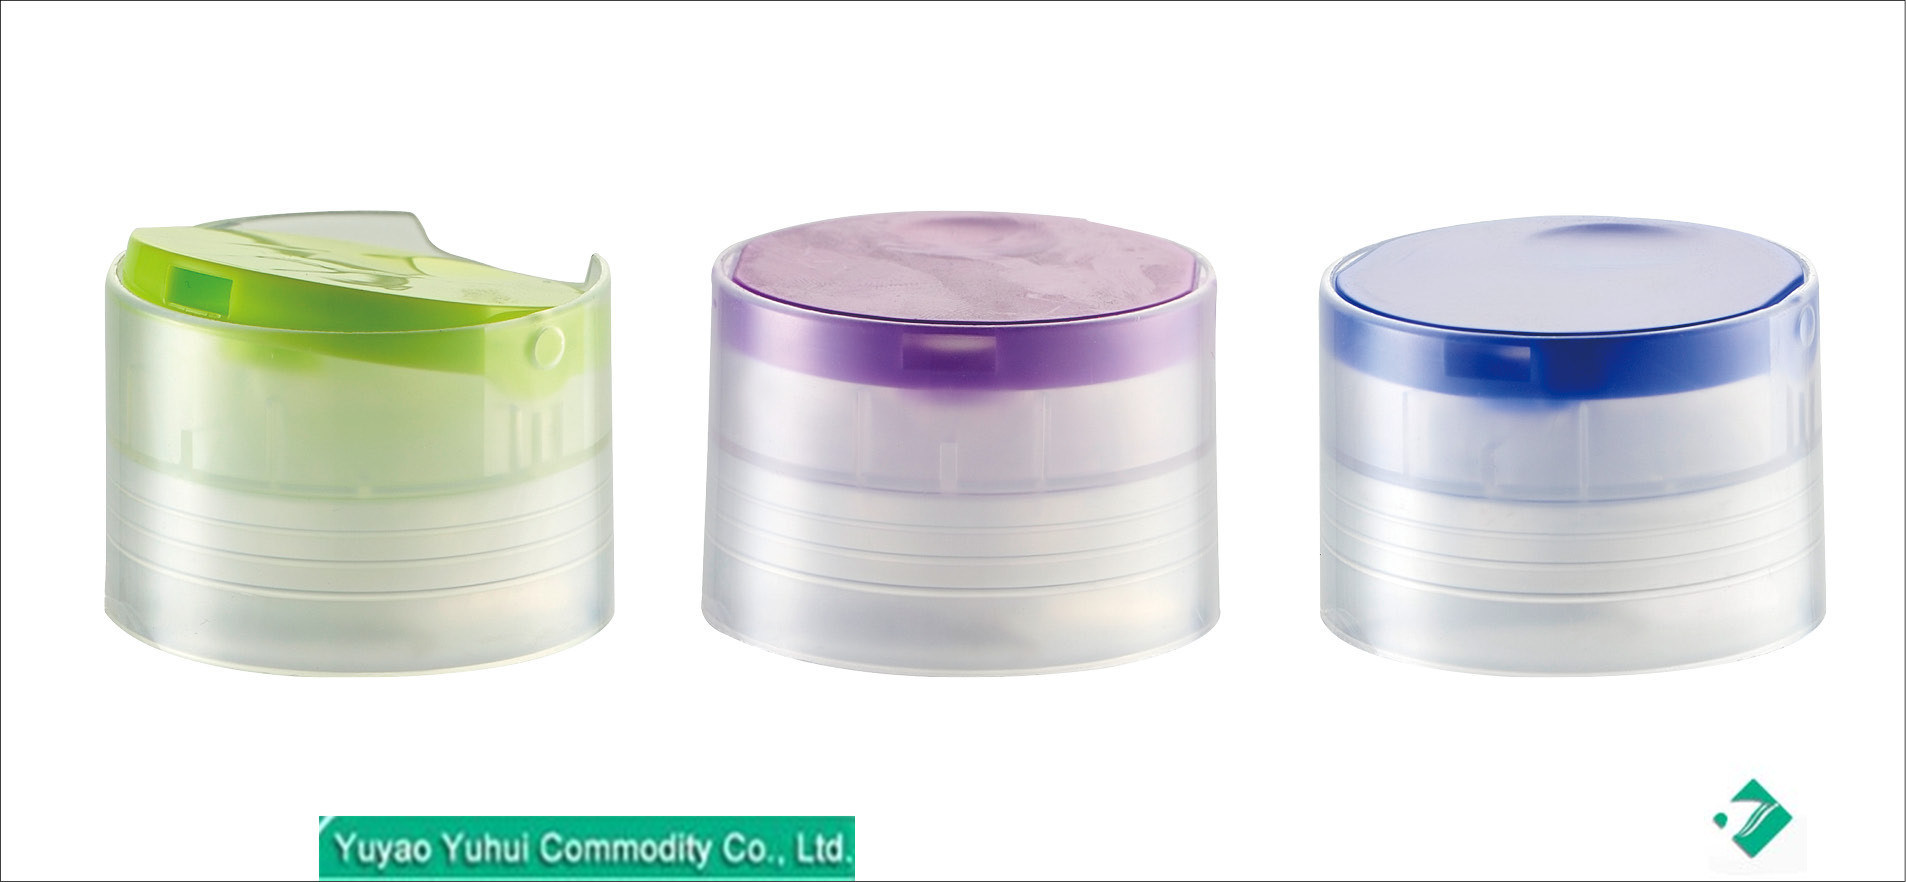 [Hot Item] Cylinder Type Cap Bottle Reusable Plastic Double Wall Disc Caps